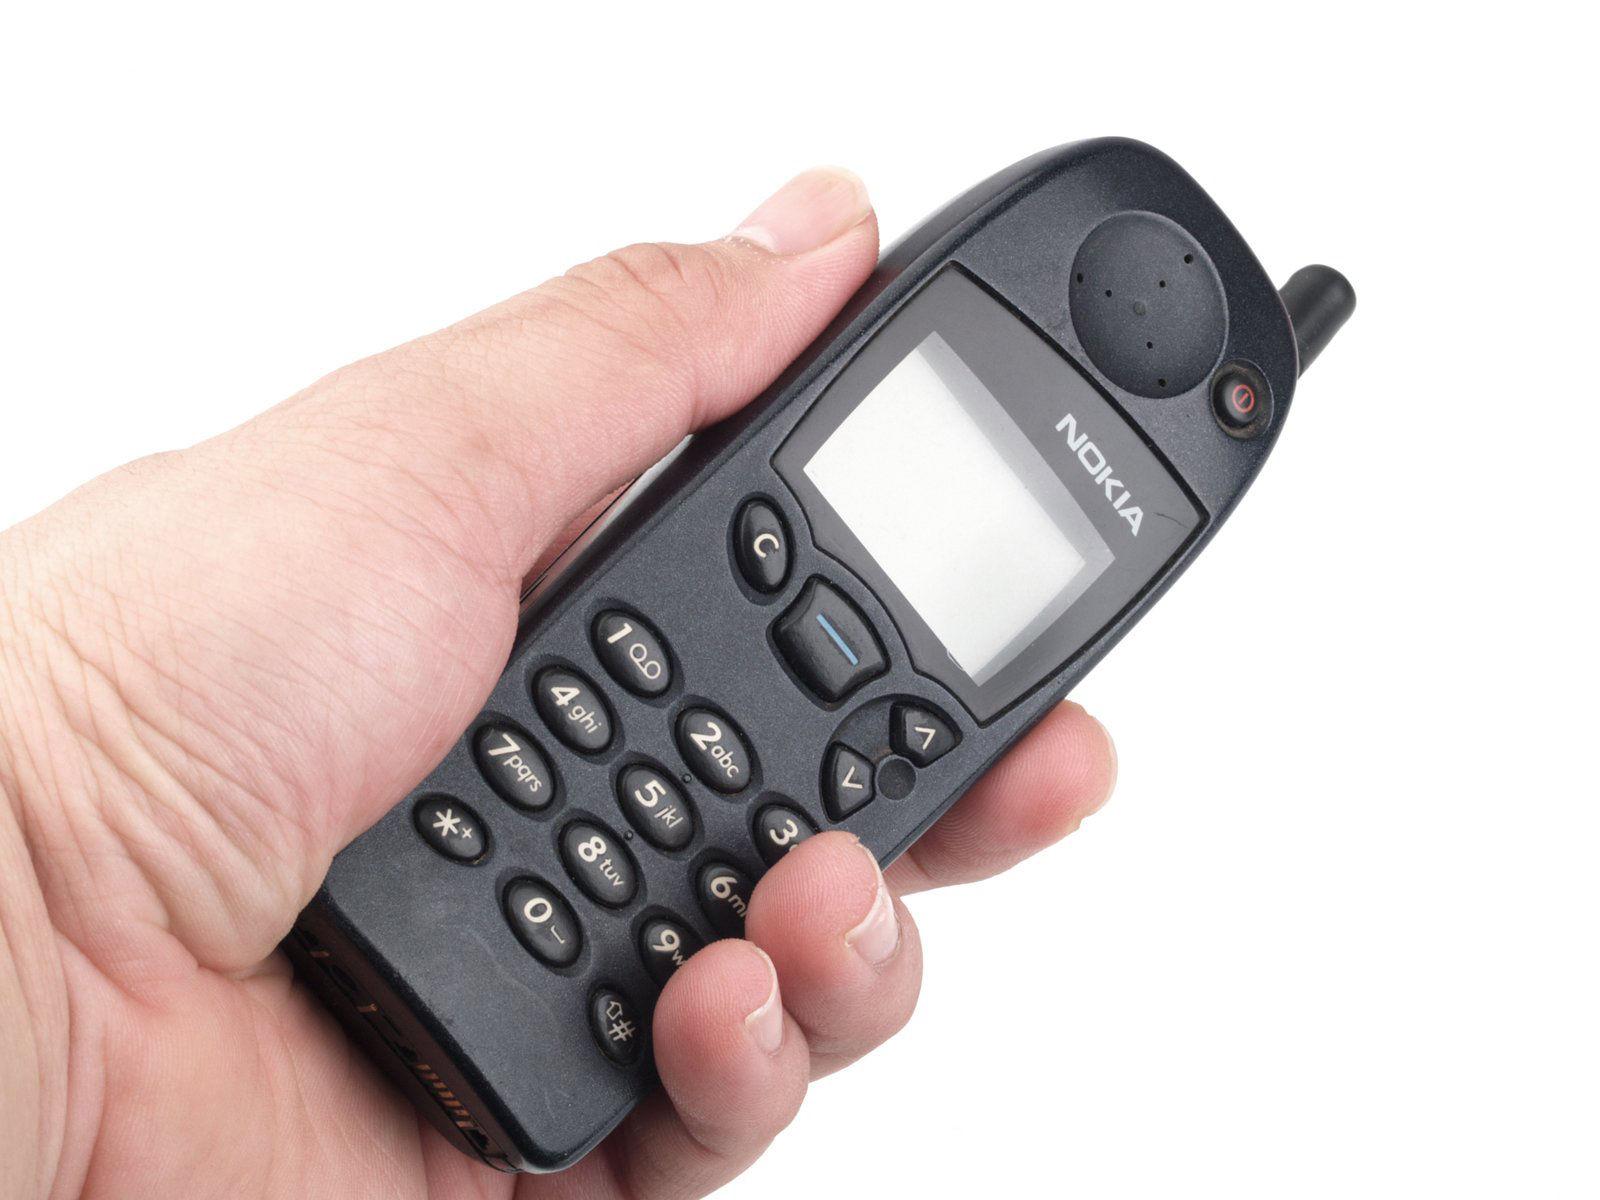 Original Nokia 5110 2g Gsm 900 Unlocked Cellphone High Quality Old Mobile Phone Ebay